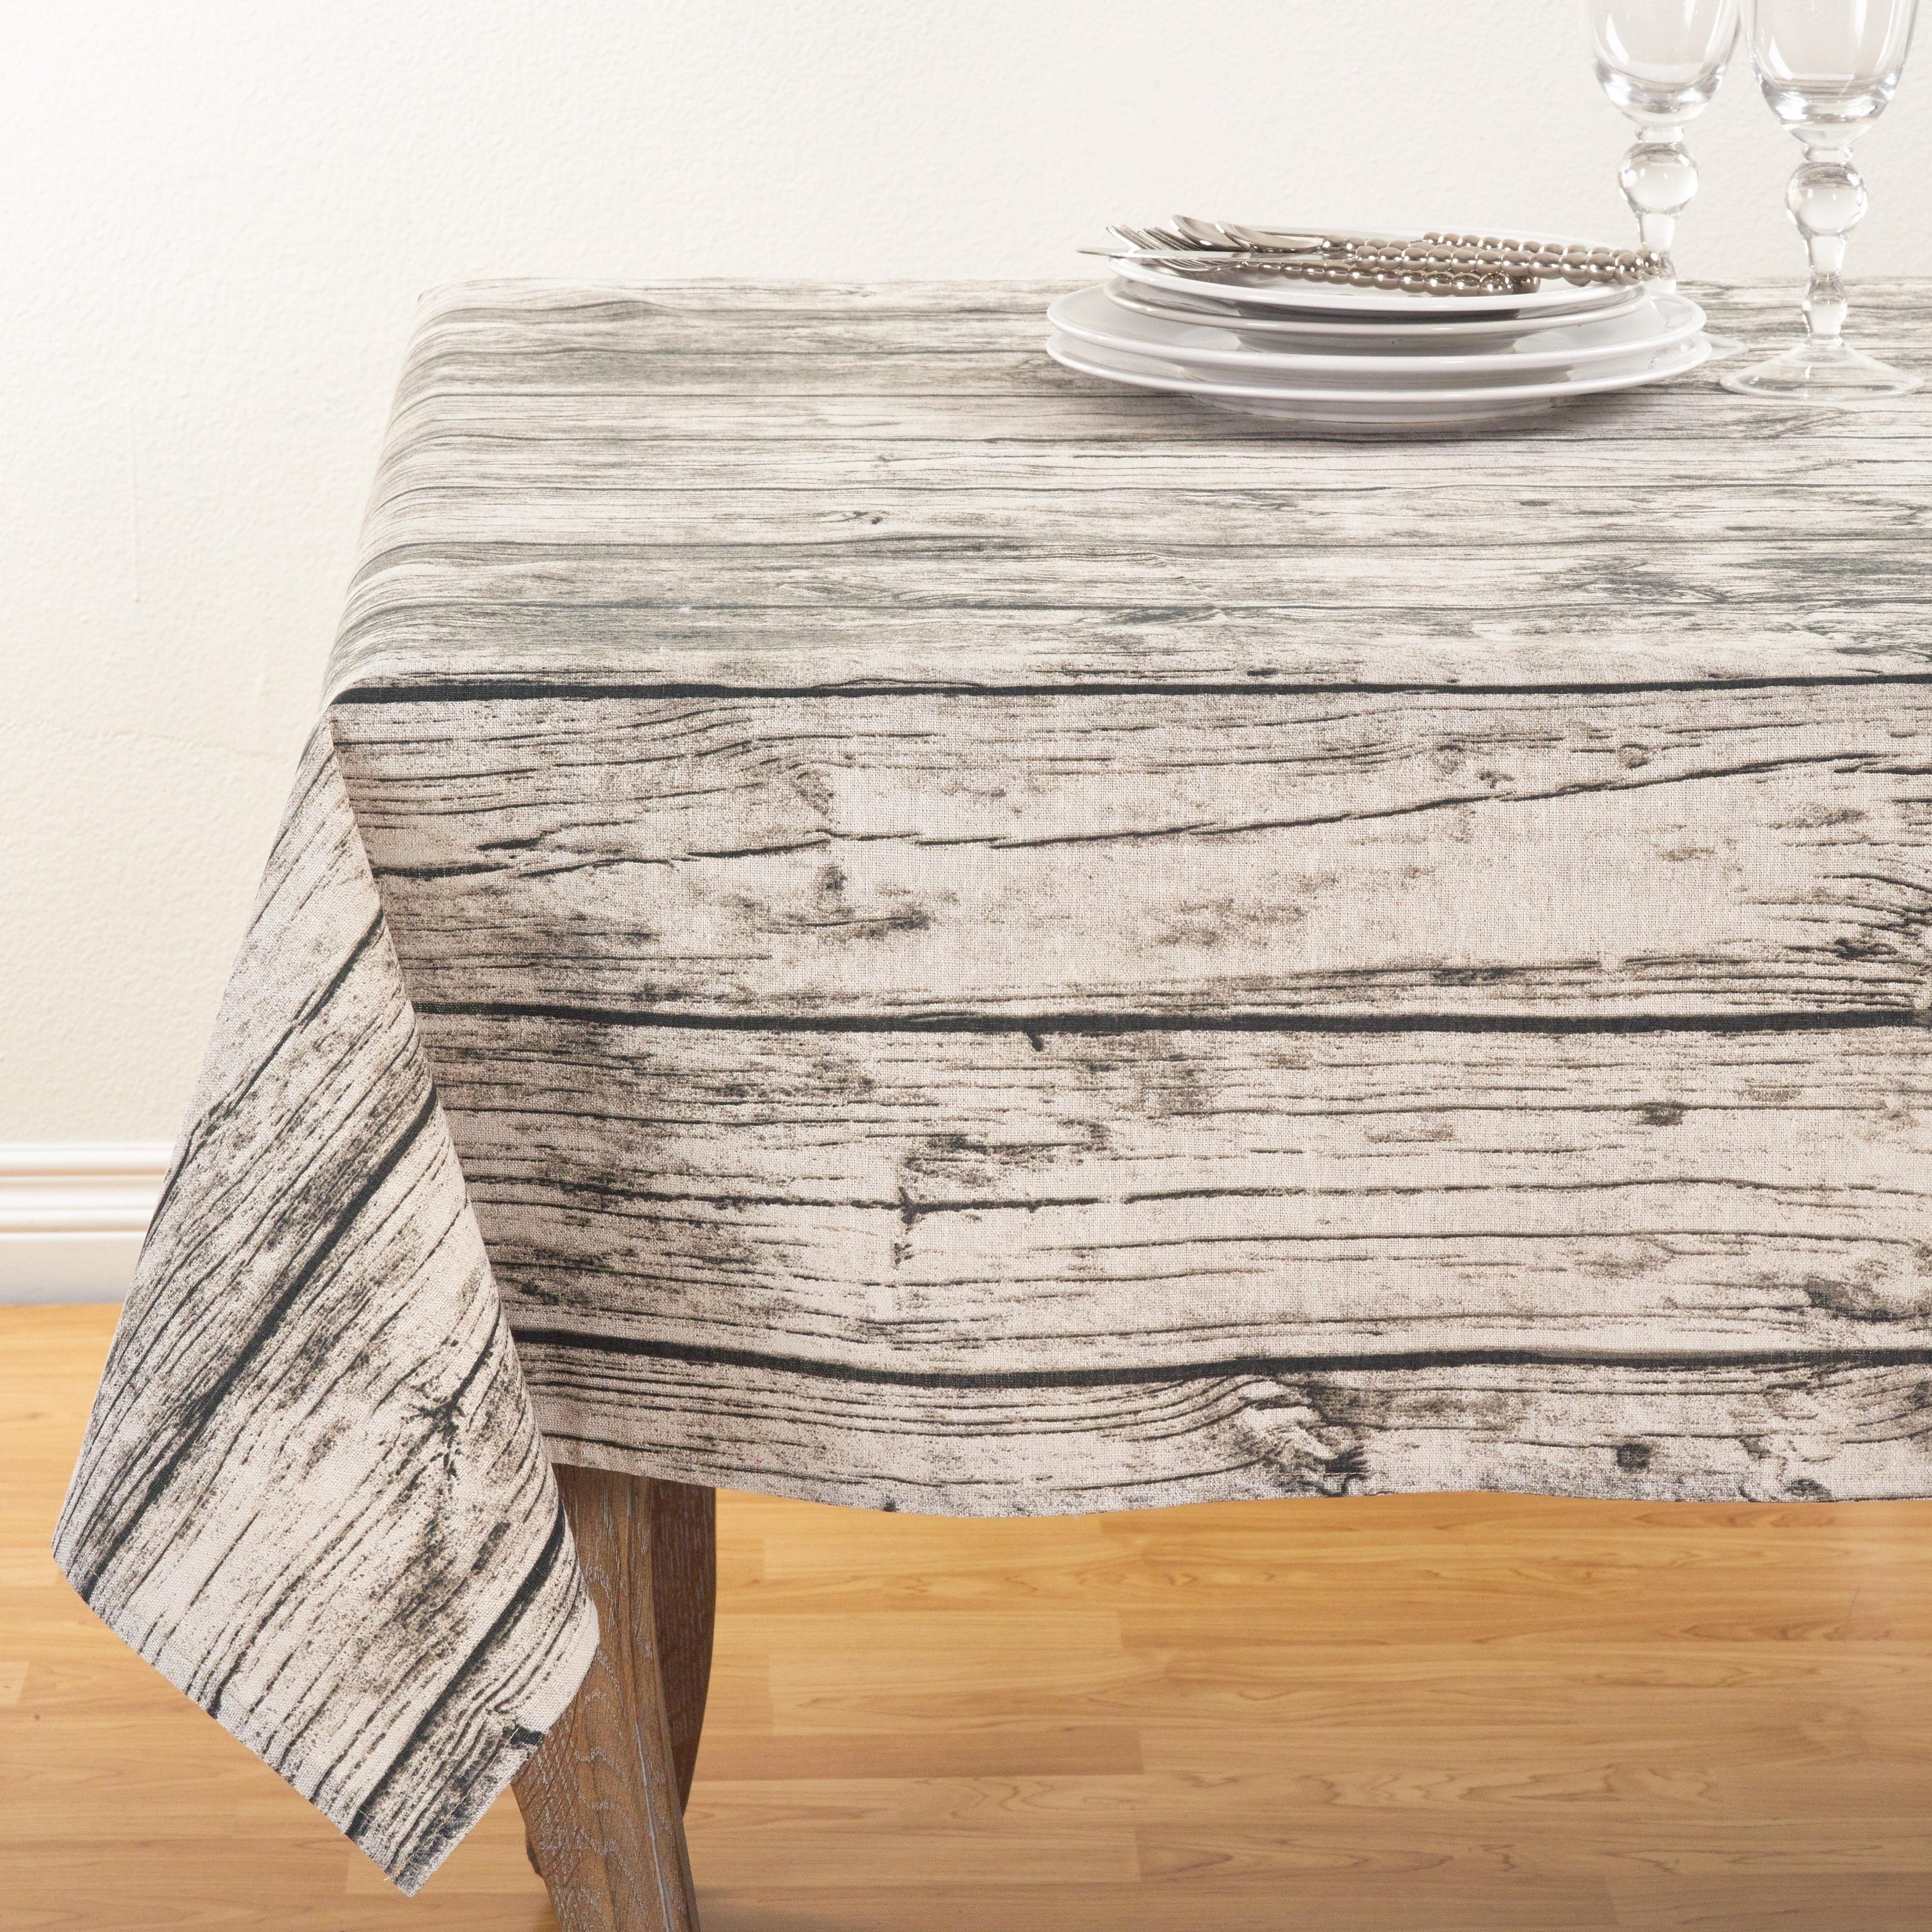 Brilliant Wood Grain Design Cotton Tablecloth 60 X 60 Home Interior And Landscaping Ponolsignezvosmurscom